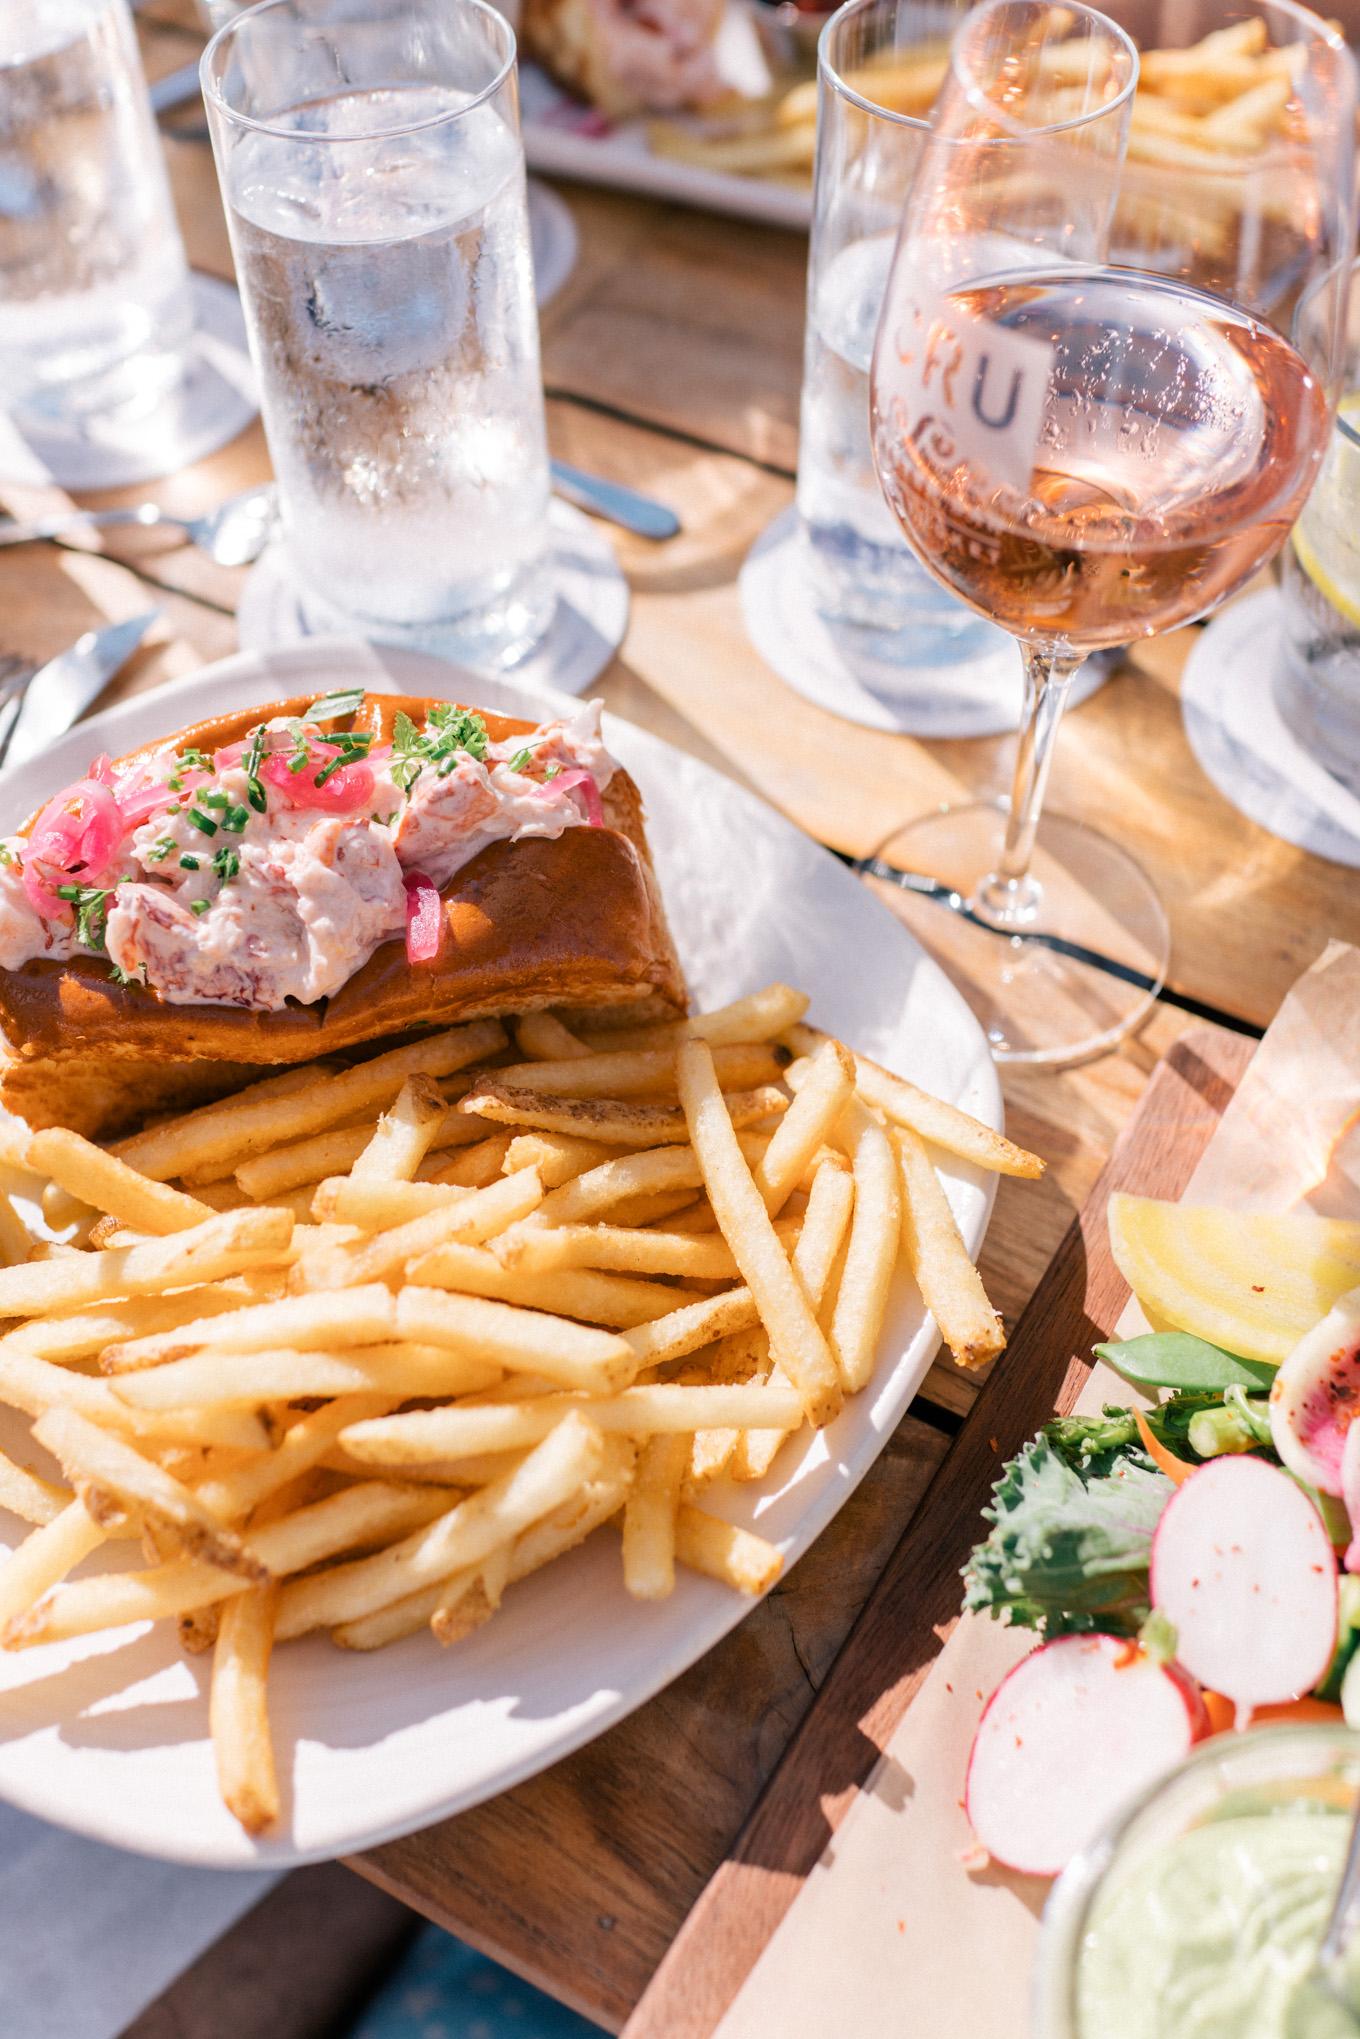 Cru Nantucket Lobster Roll and Fries